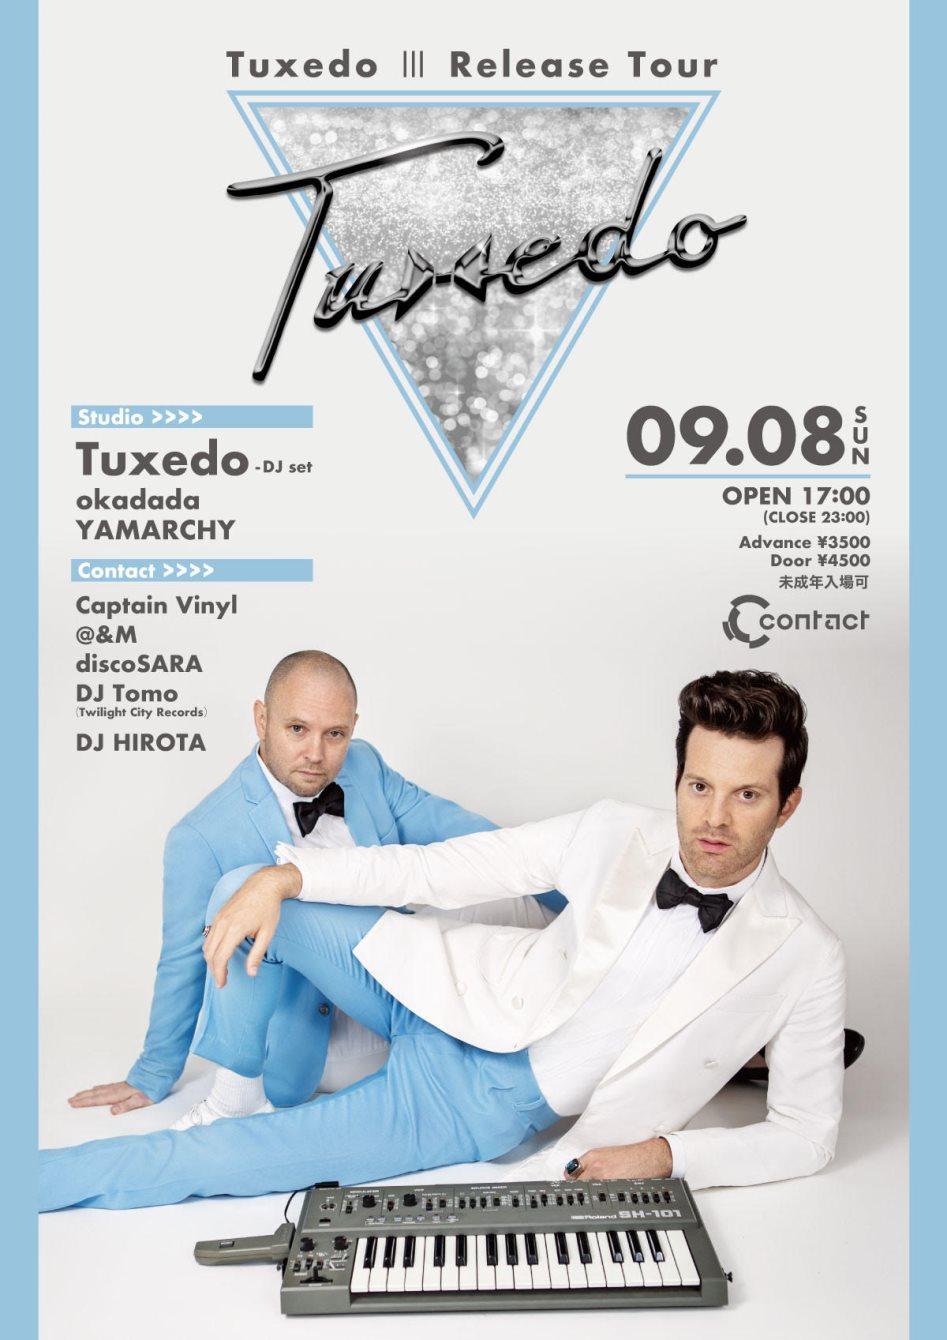 Tuxedo Ⅲ Release Tour - Flyer front